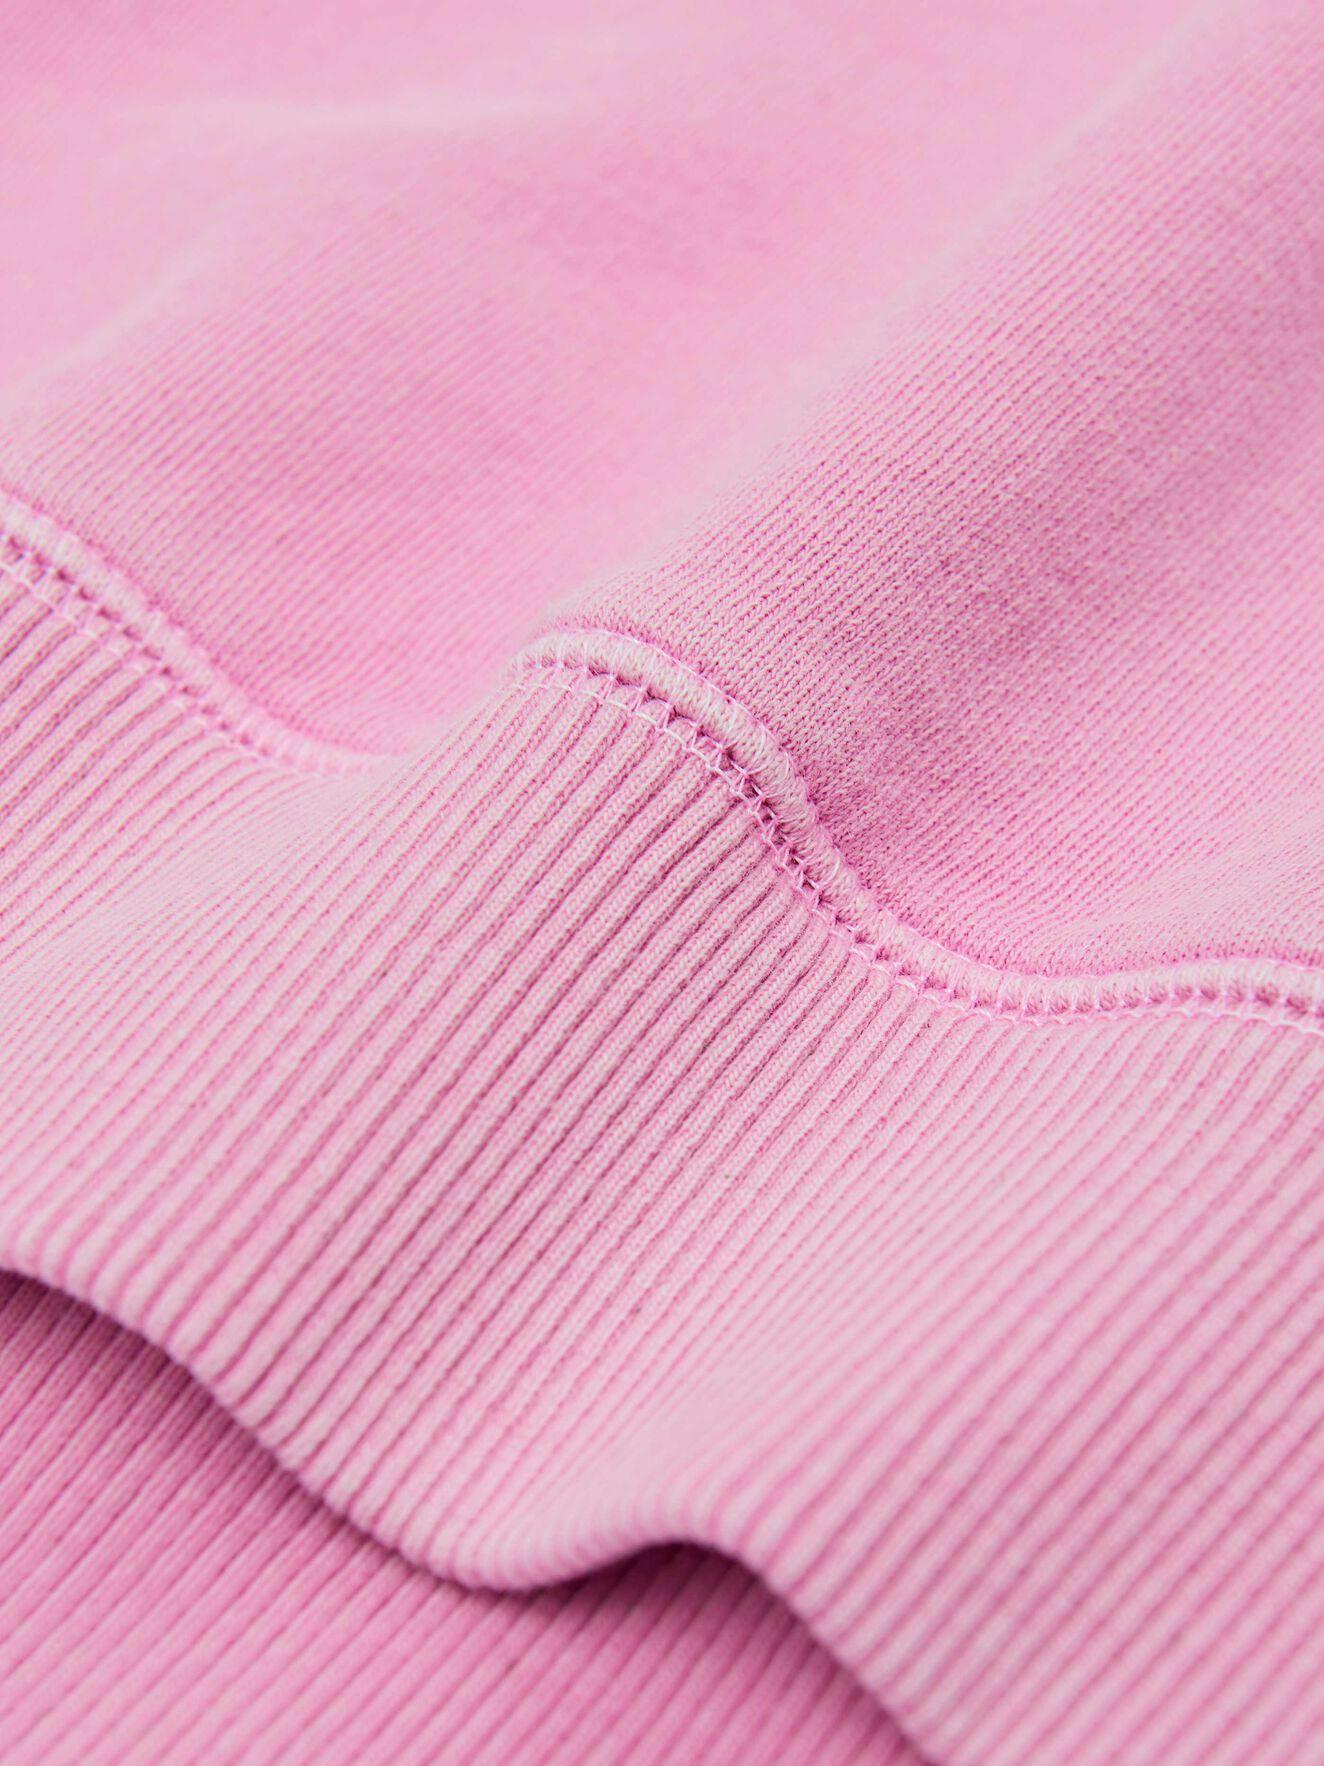 Obscura Pr Sweatshirt in Pink from Tiger of Sweden